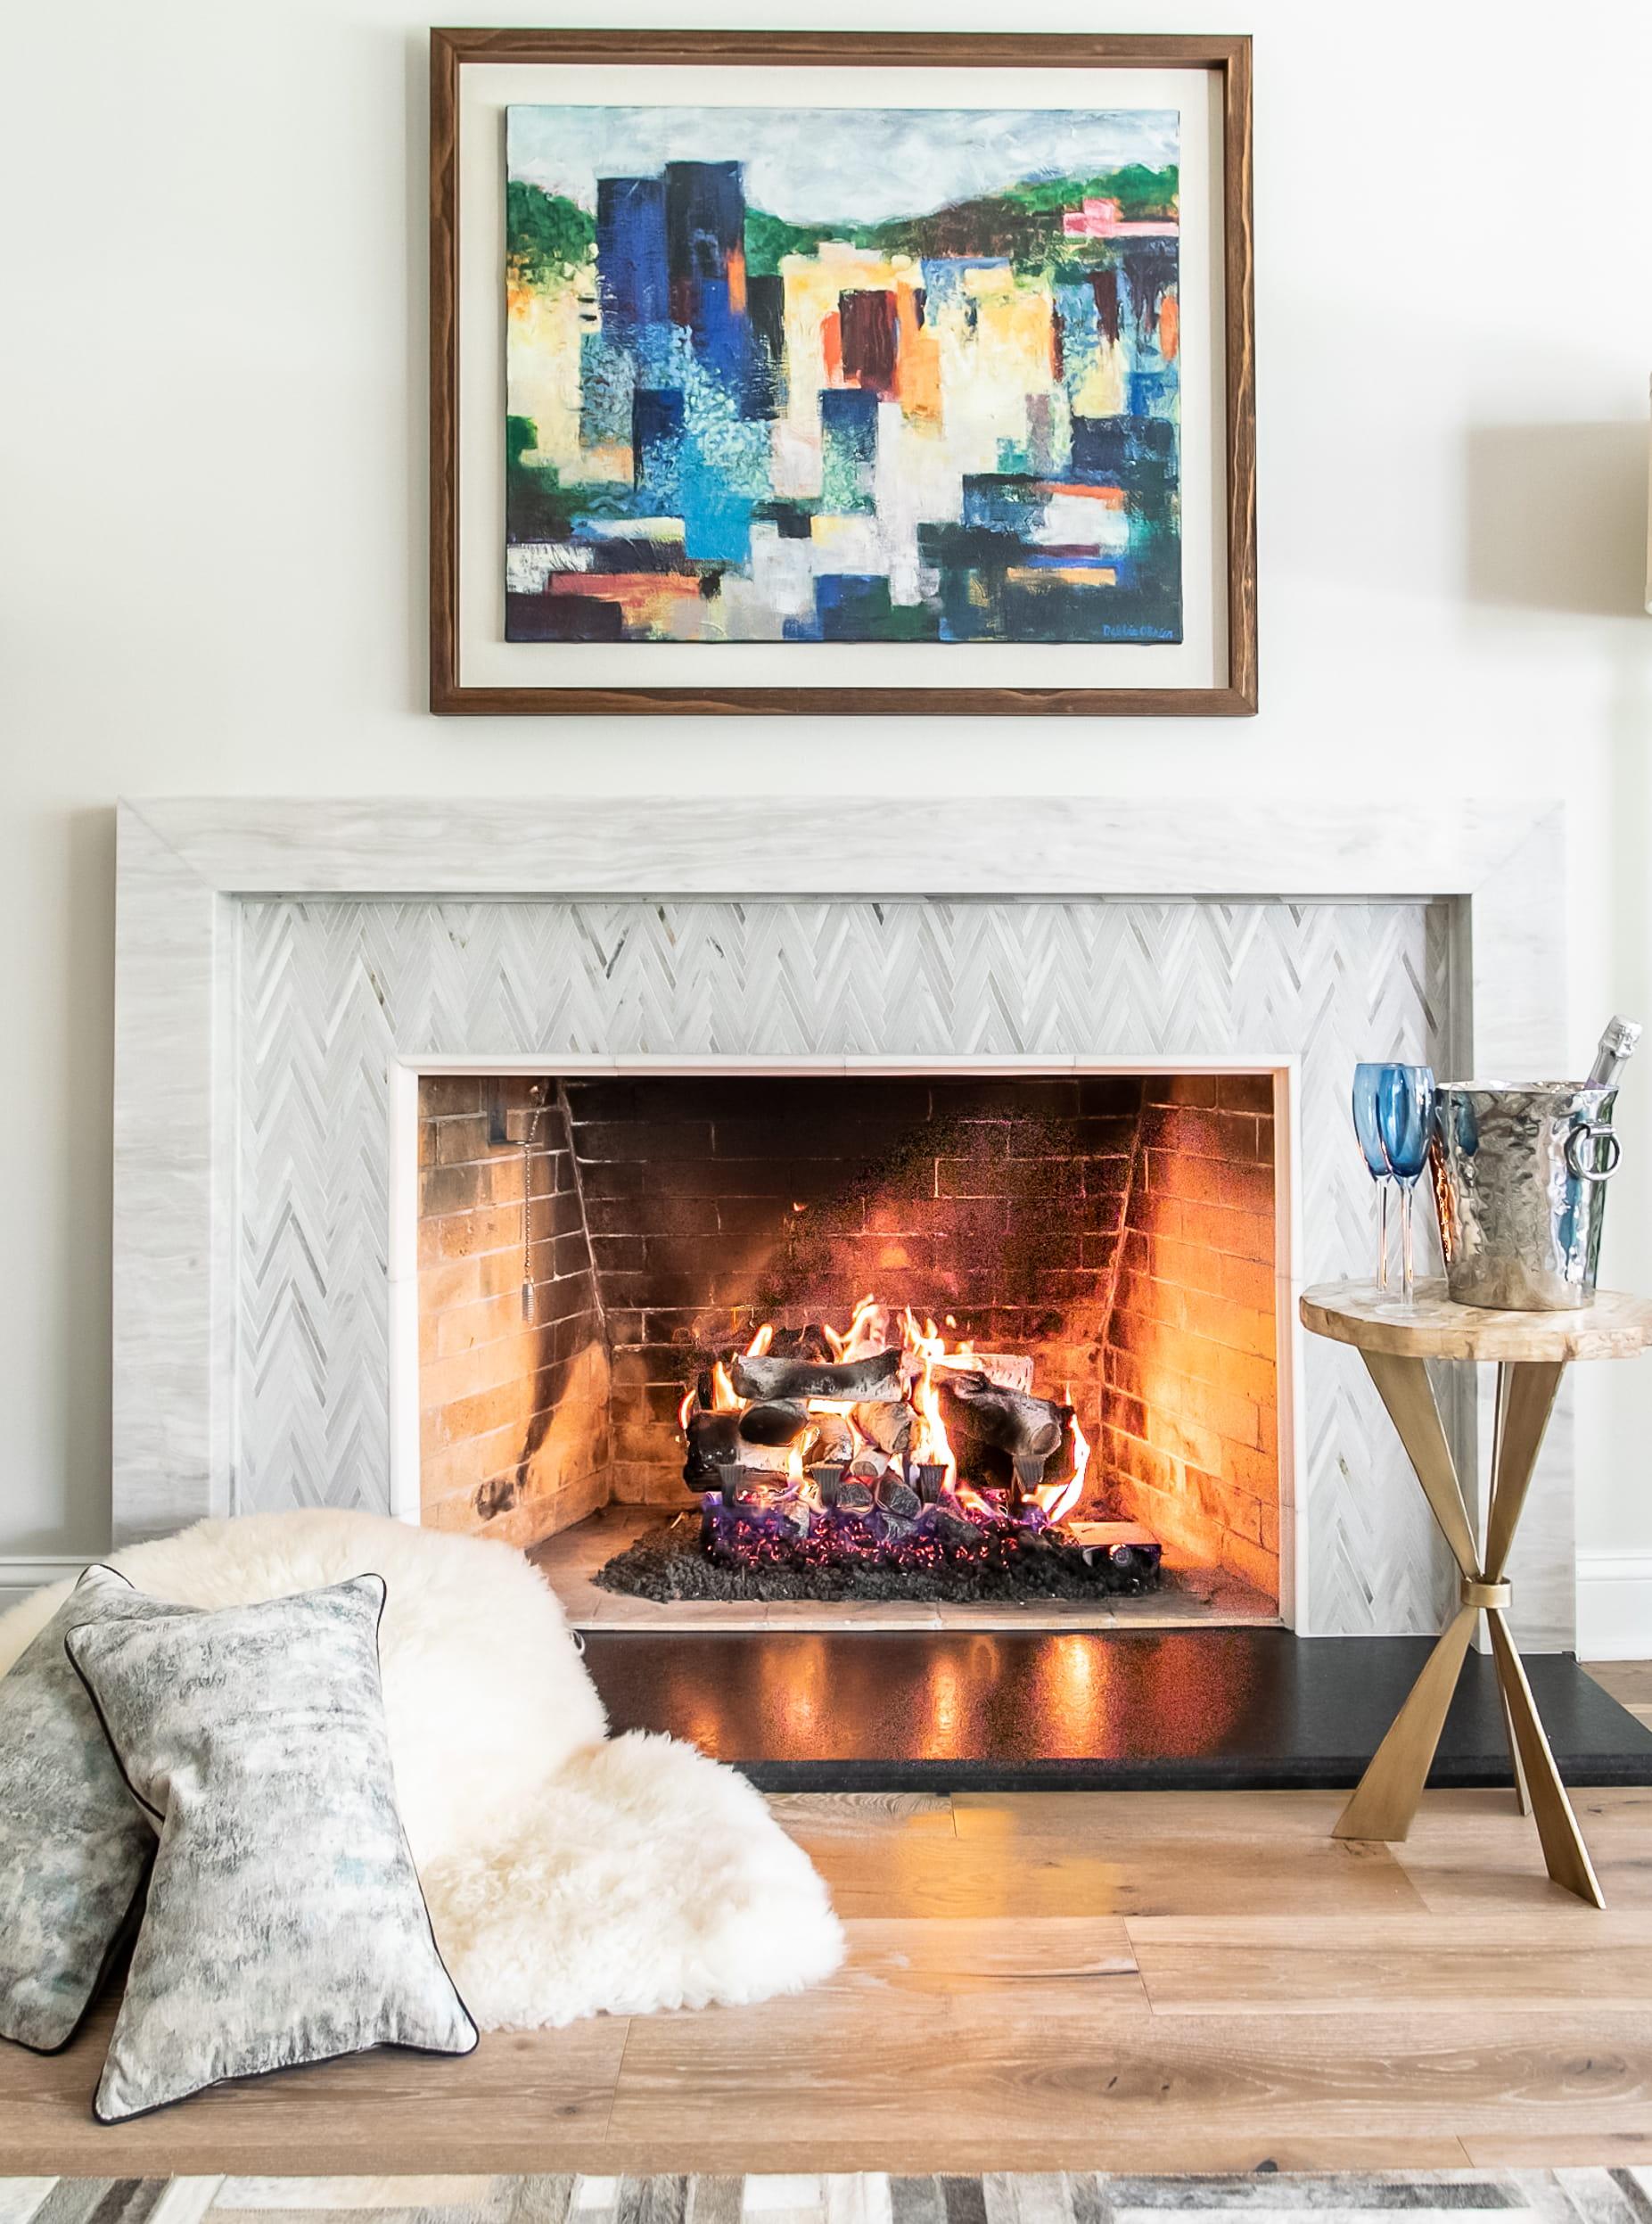 Glencoe Project | Matte & Gloss Interiors